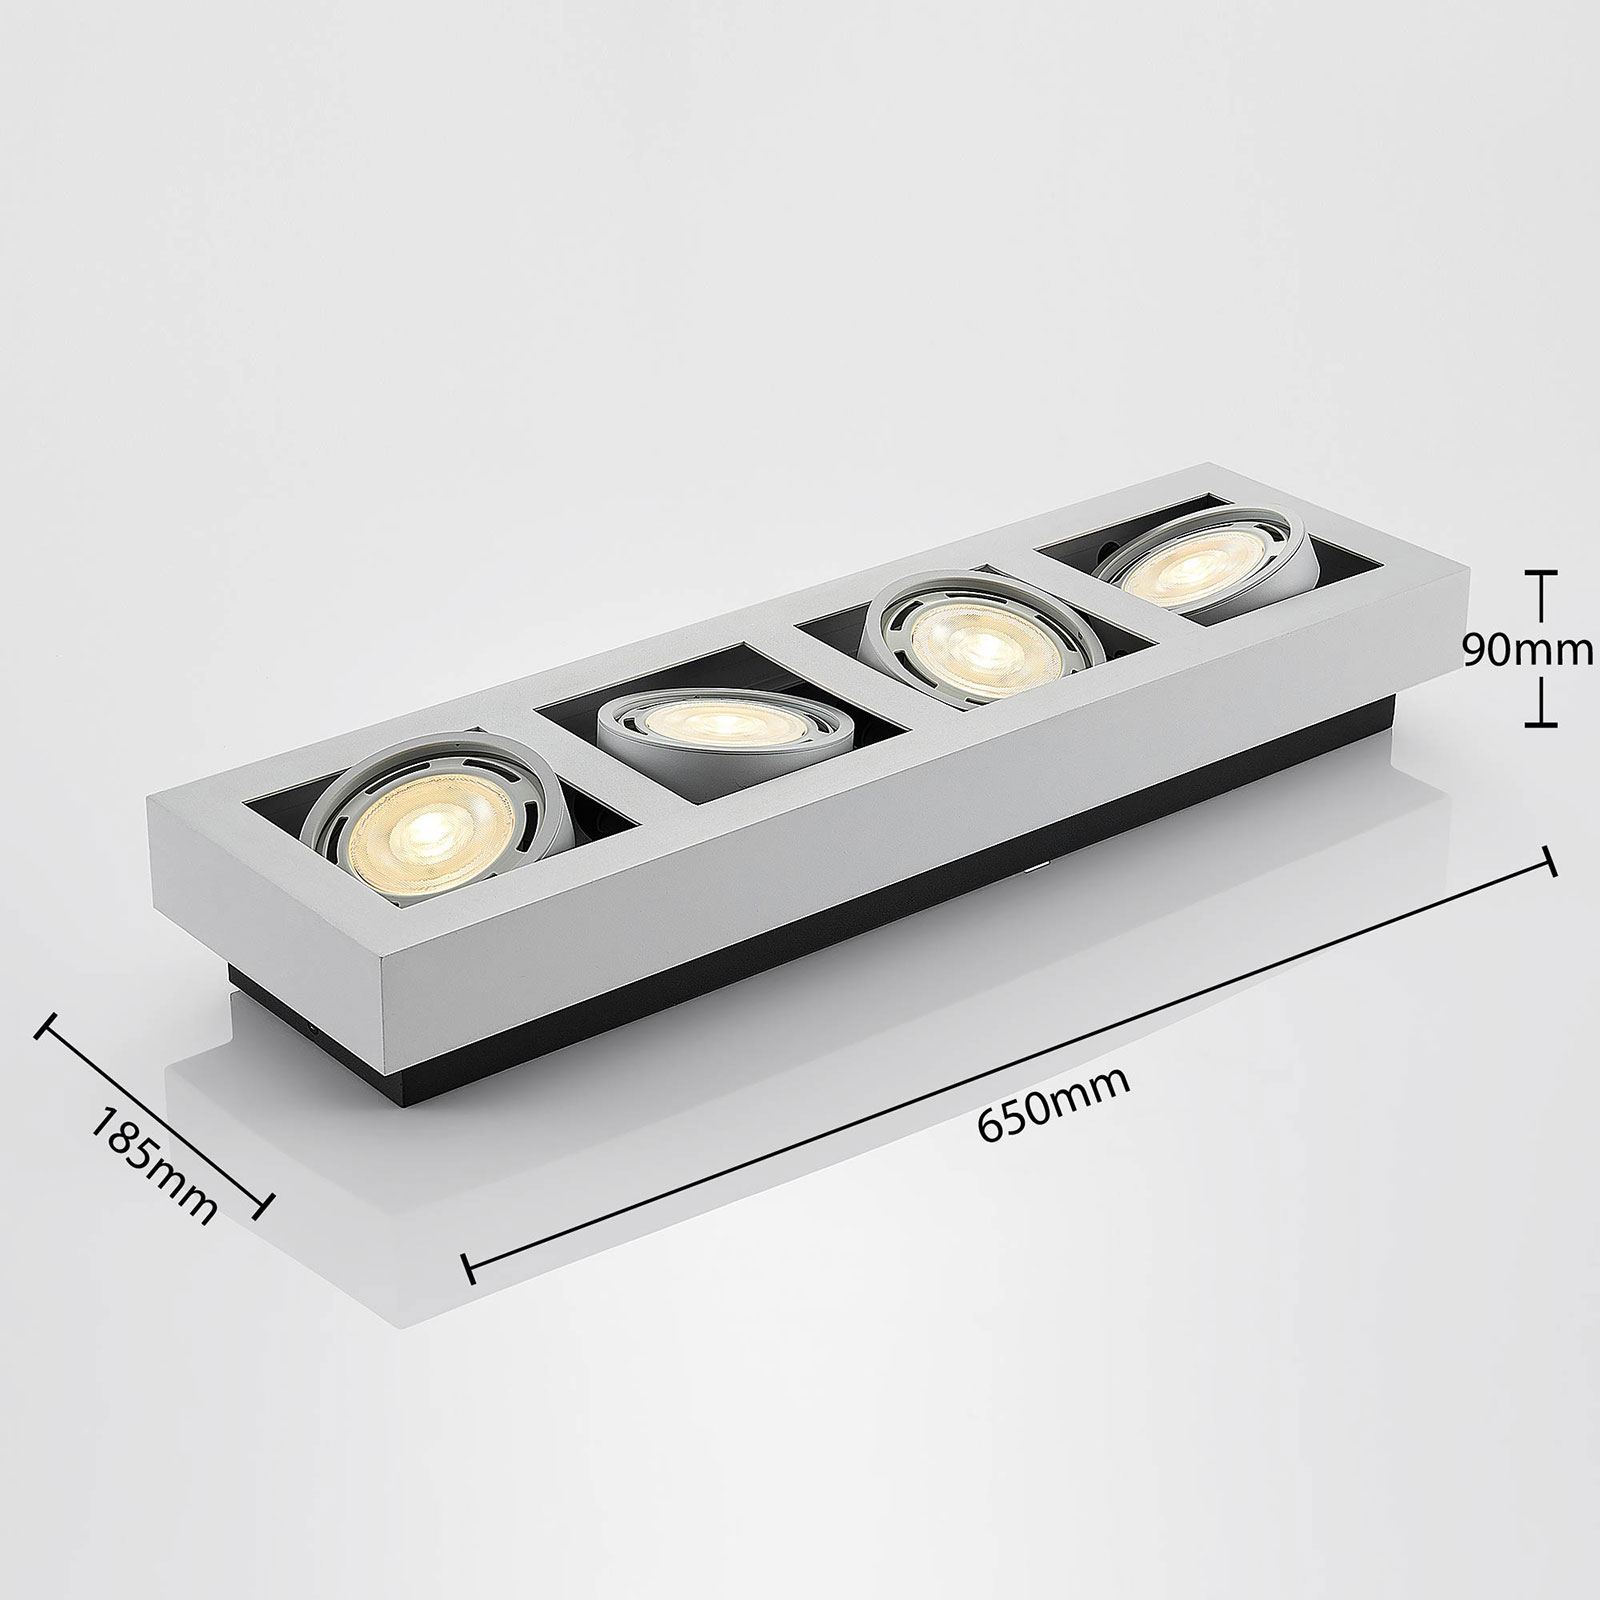 LED-Deckenstrahler Ronka, 4-fl., lang, weiß